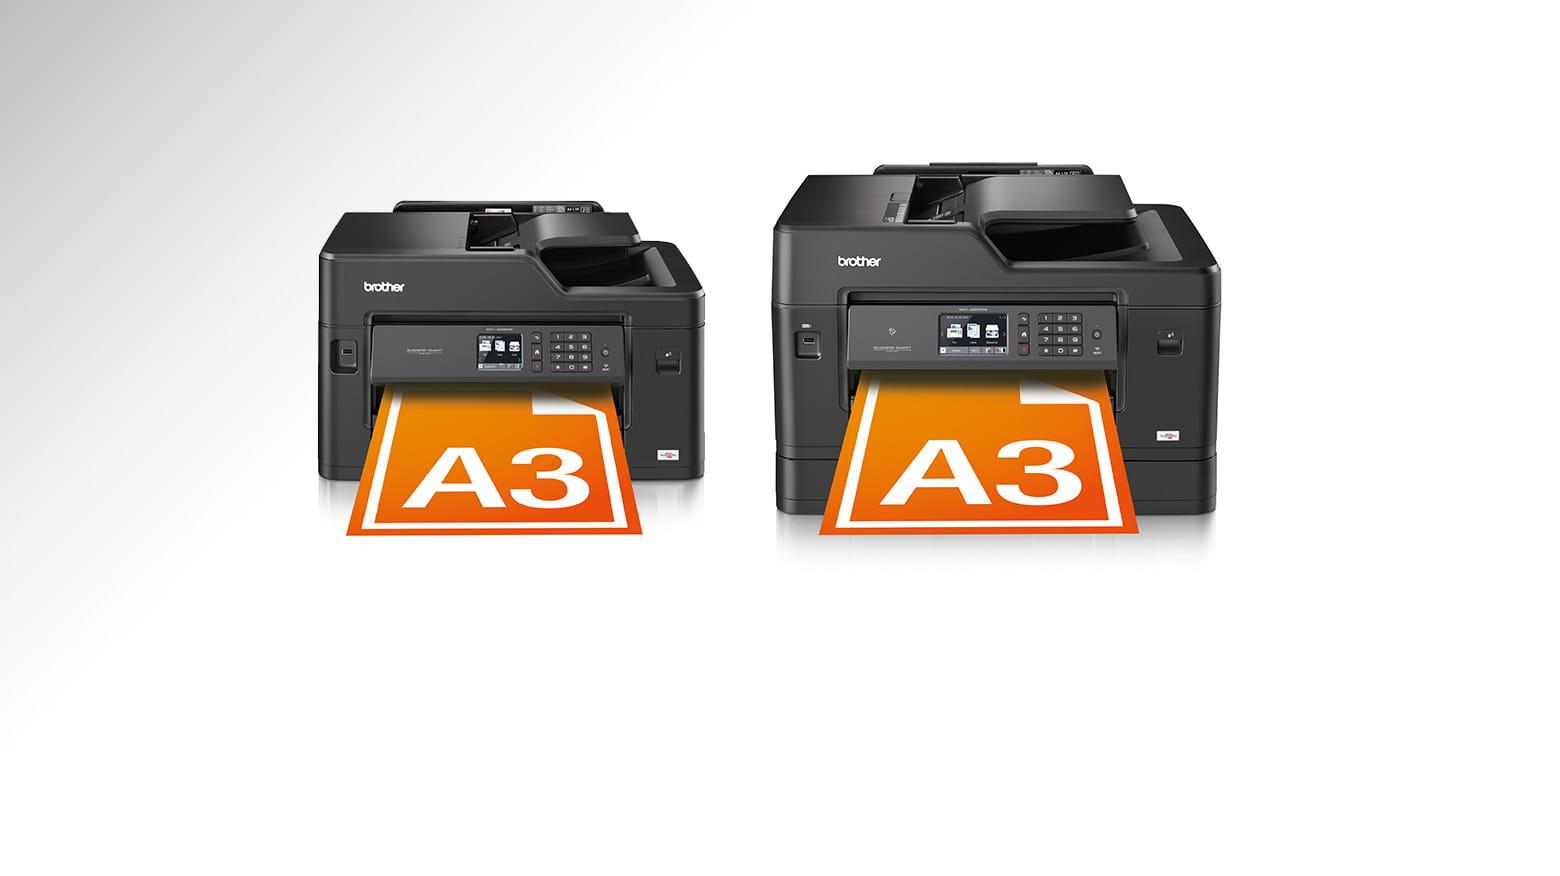 Business A3 inkjetprinters